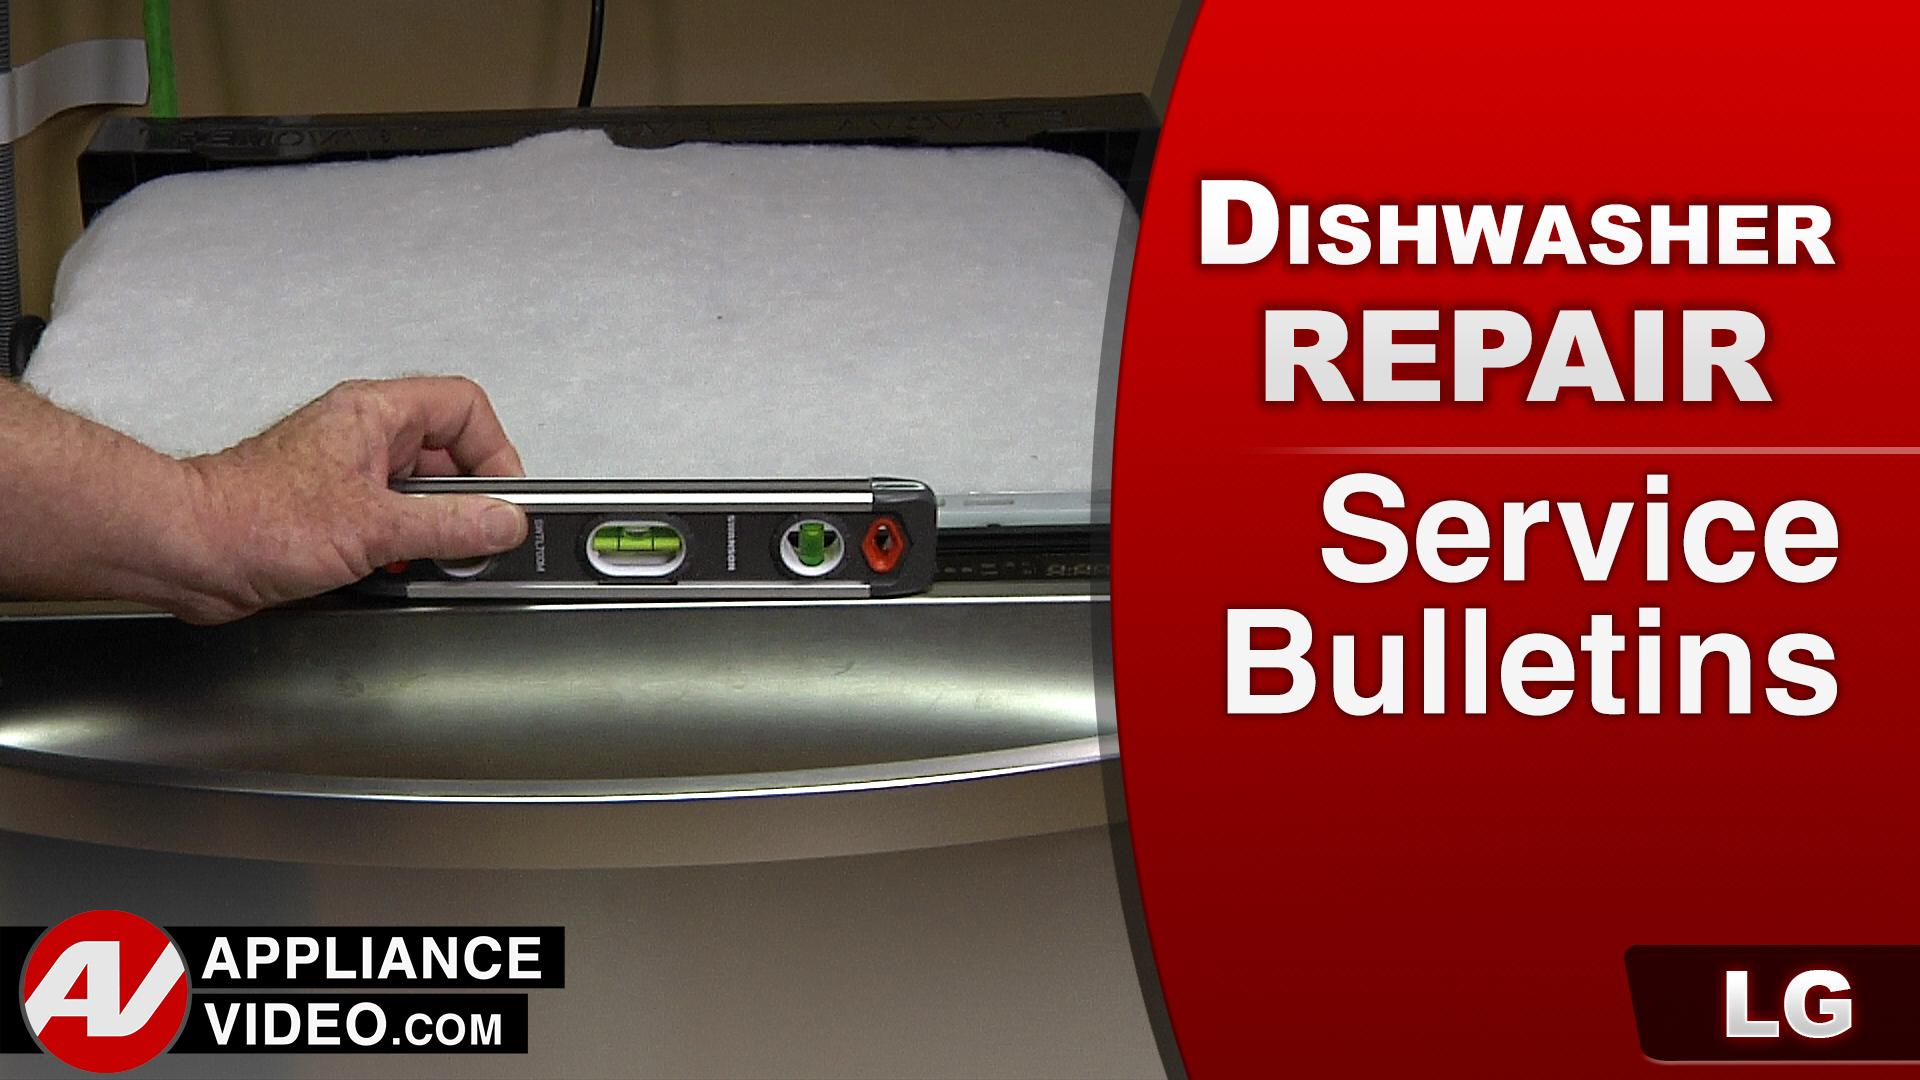 LG LDF7774ST Dishwasher – Service Bulletin